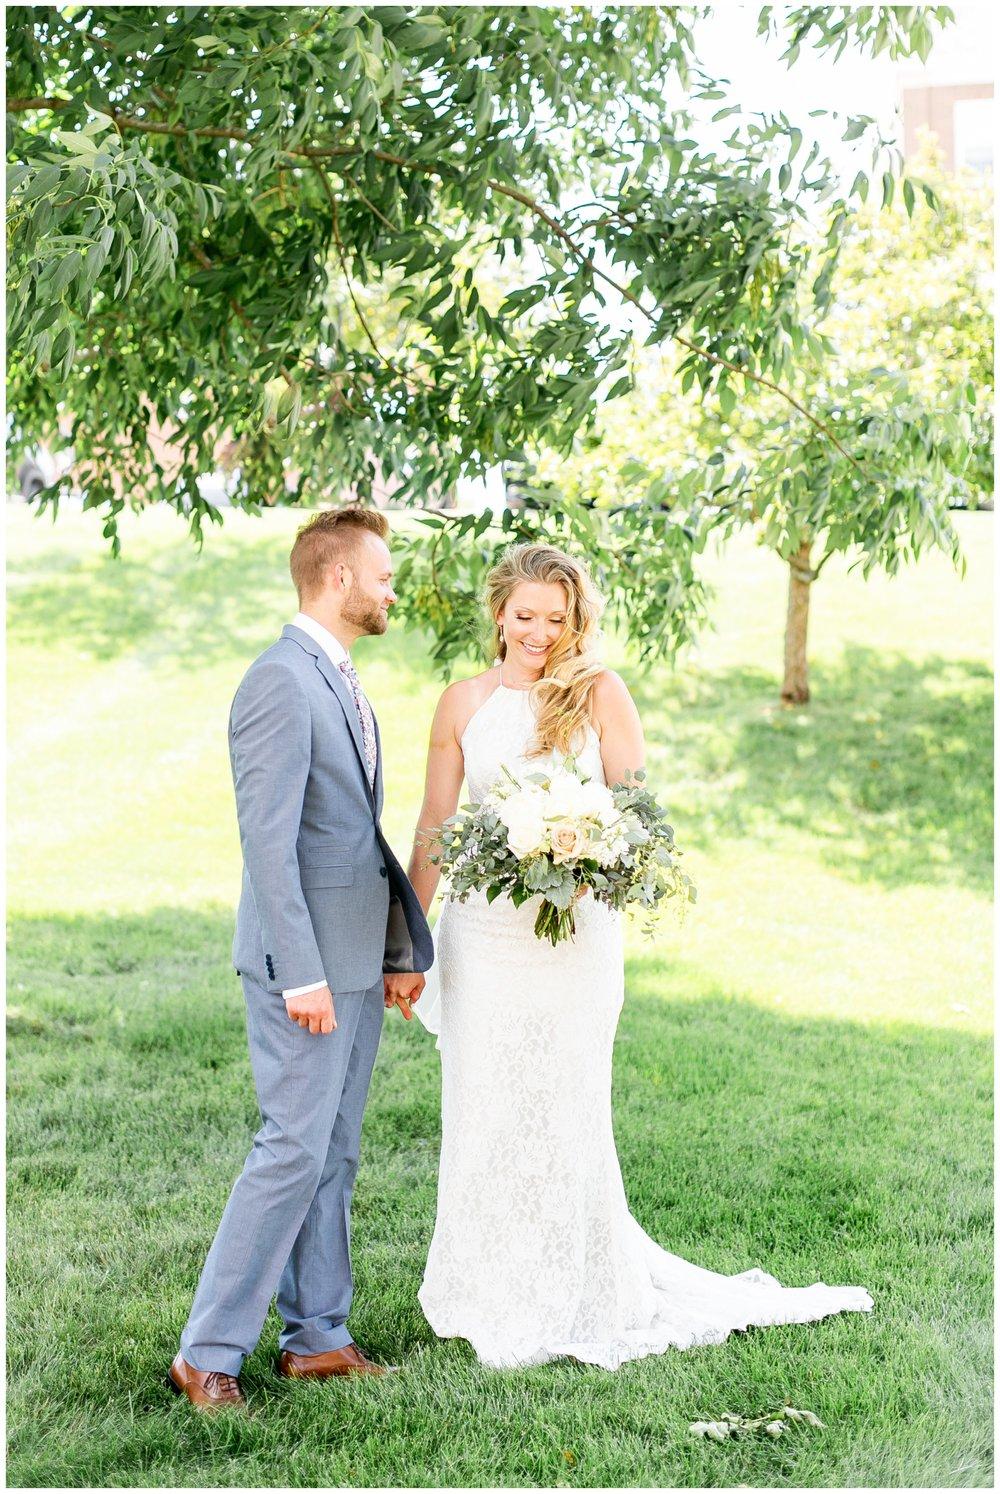 the_cupola_barn_wedding_delafield_resort_oconomowoc_wisconsin_0345.jpg